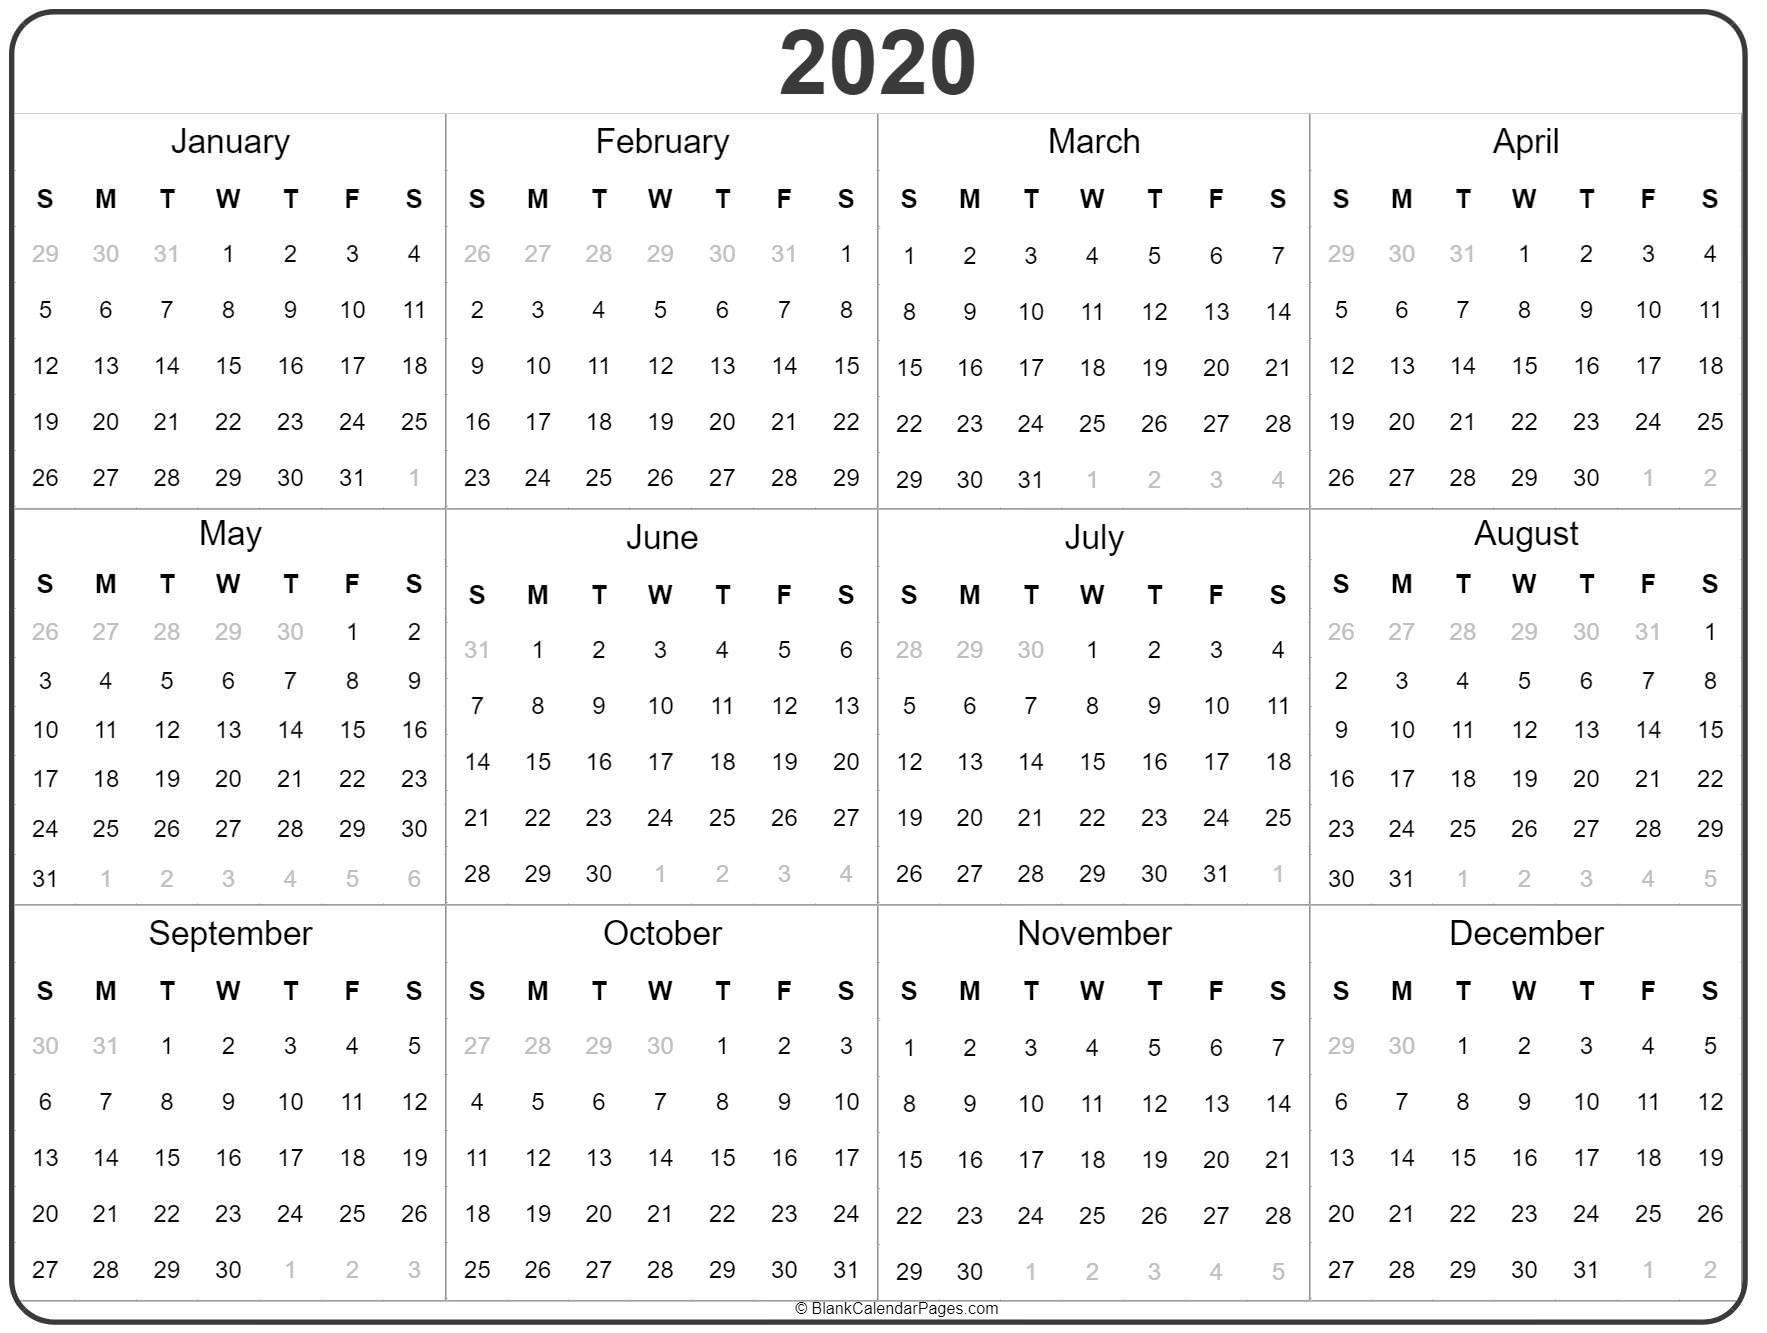 Full Year Calendar 2020 Printable - Wpa.wpart.co for Yearly Printable Calendar 2020